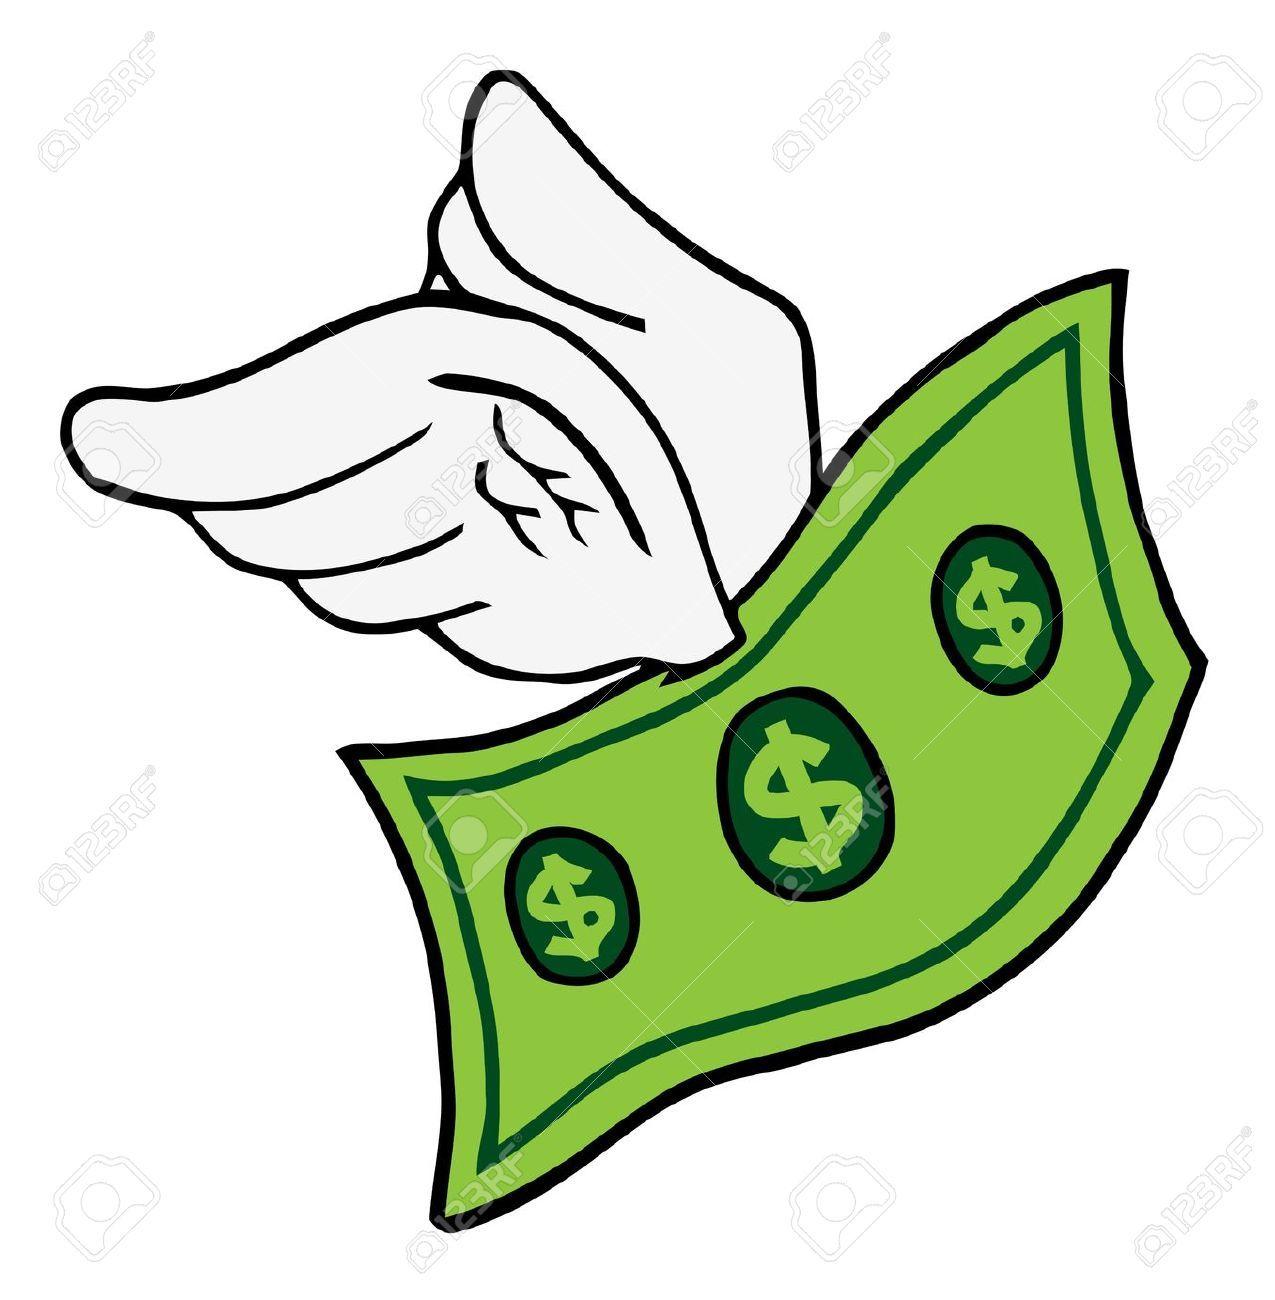 Money flying clipart » Clipart Portal.